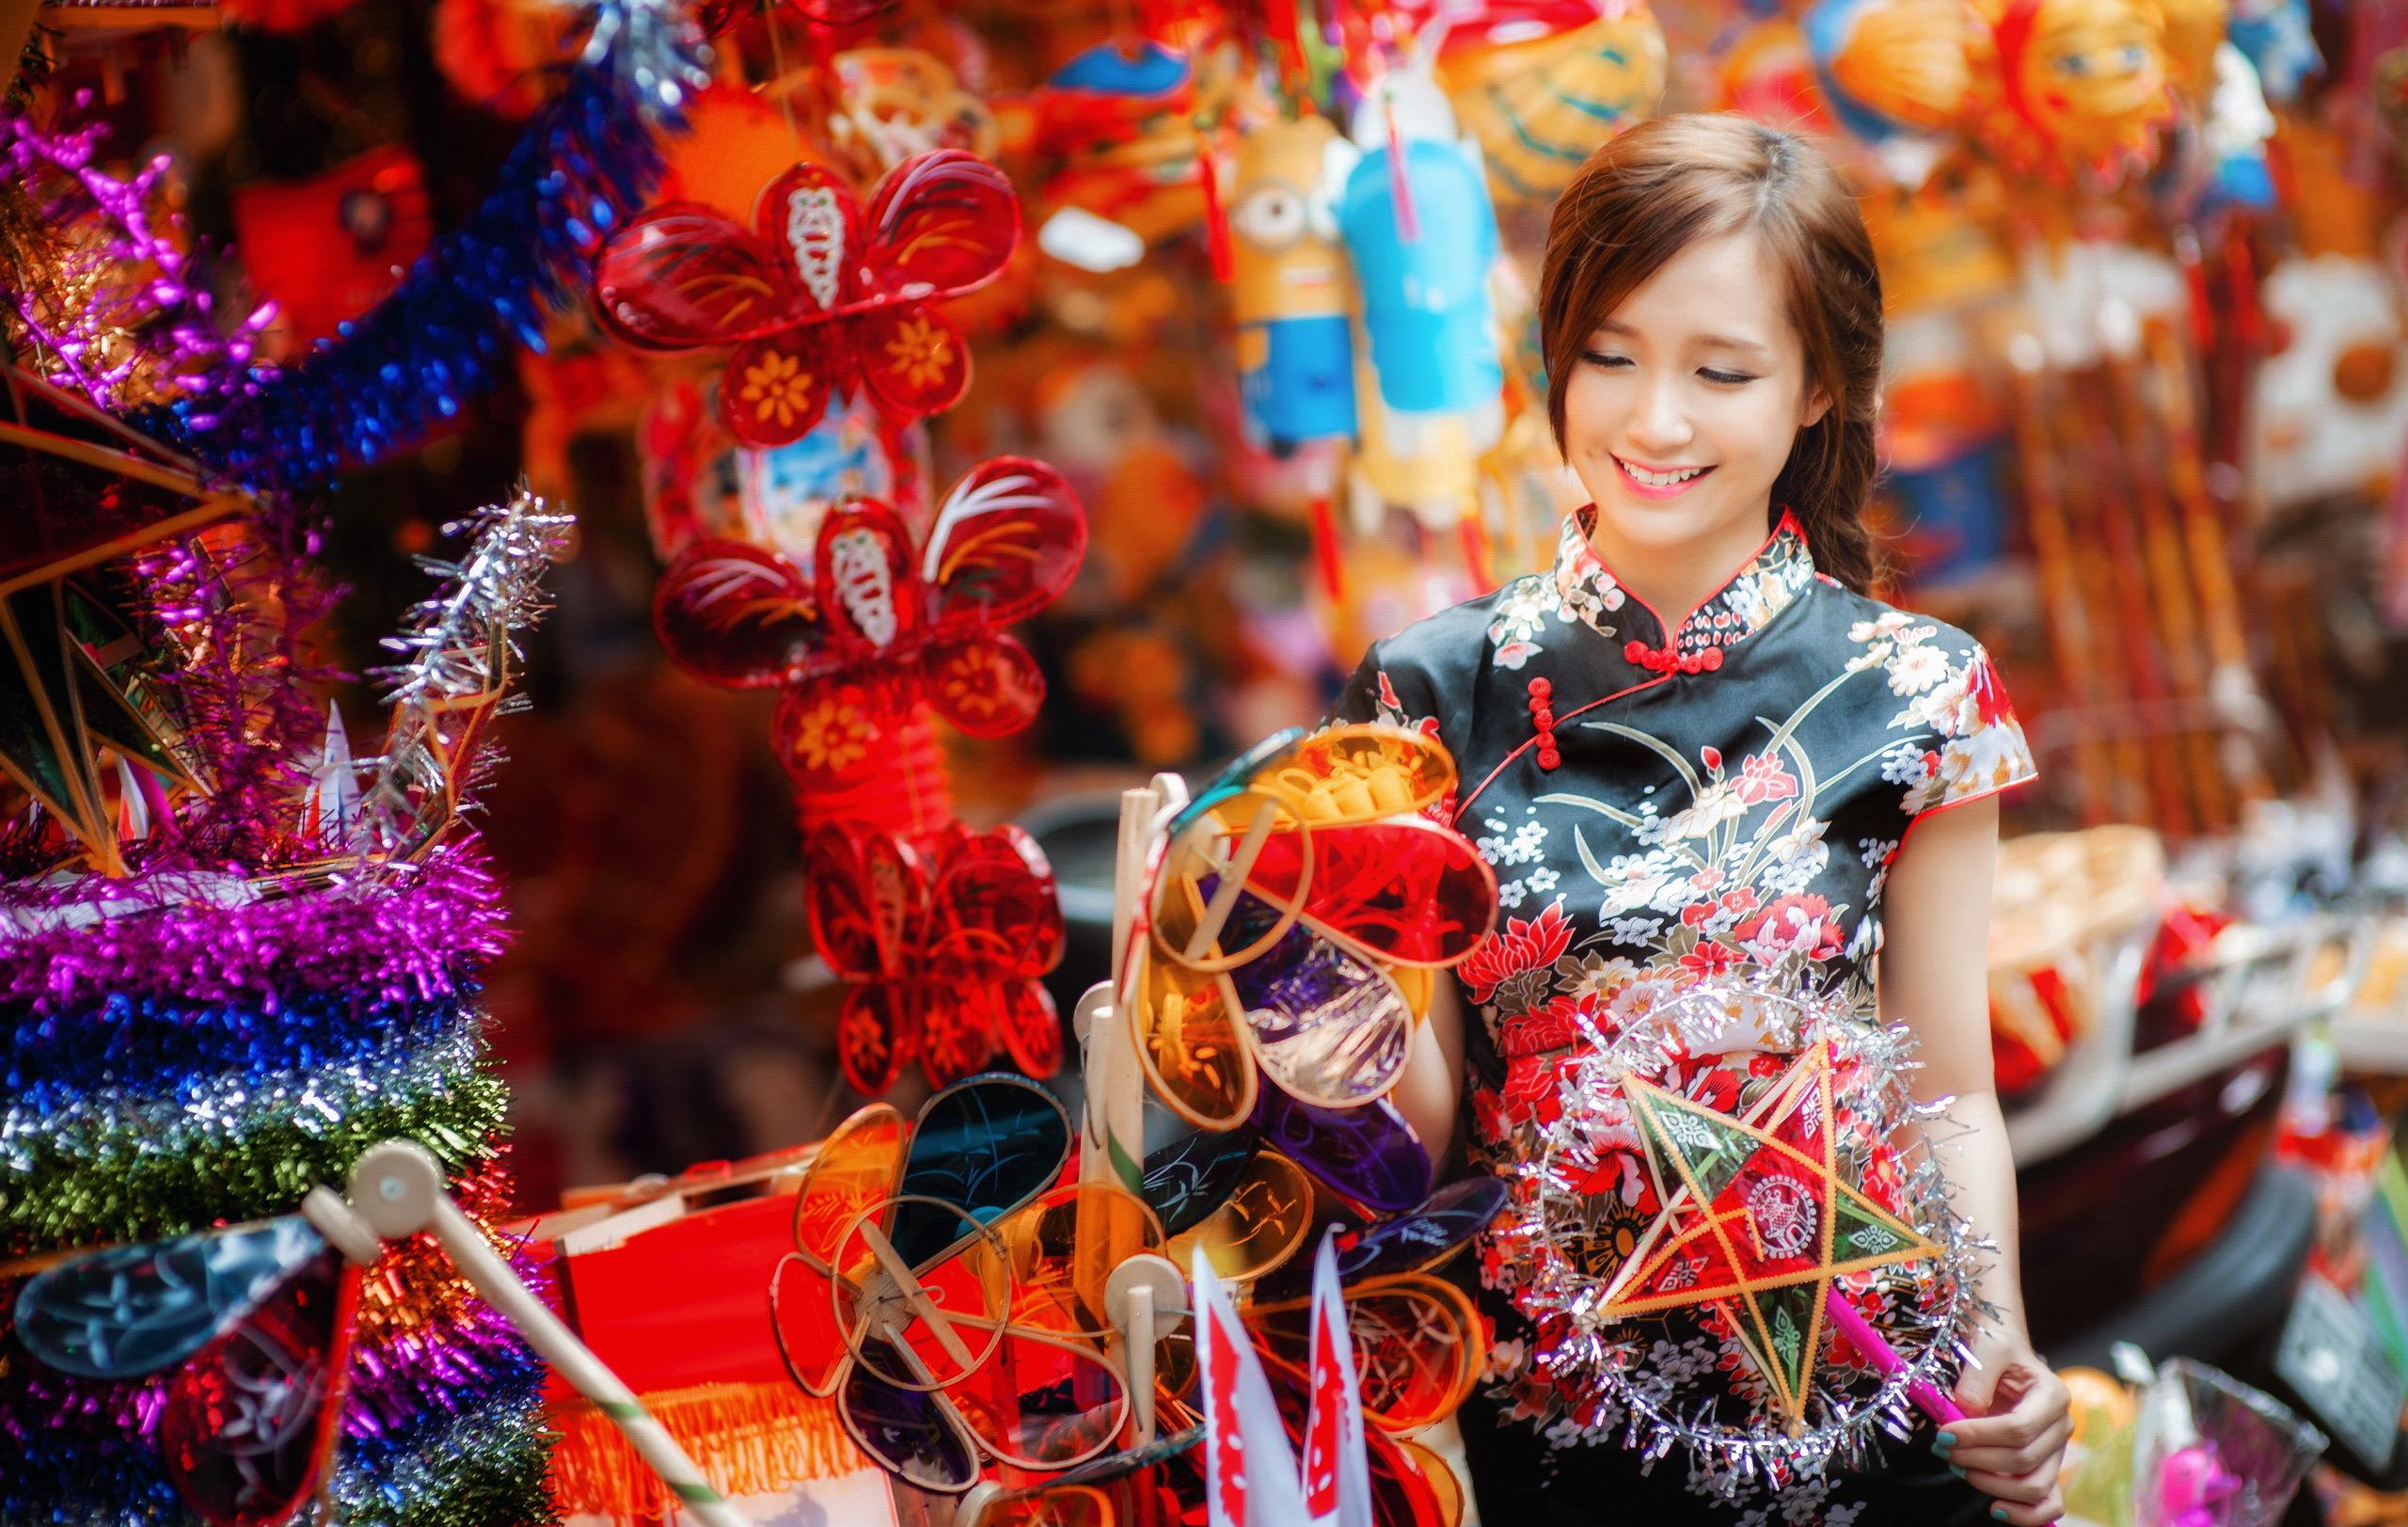 Numerous activities for children on Mid-Autumn Festival